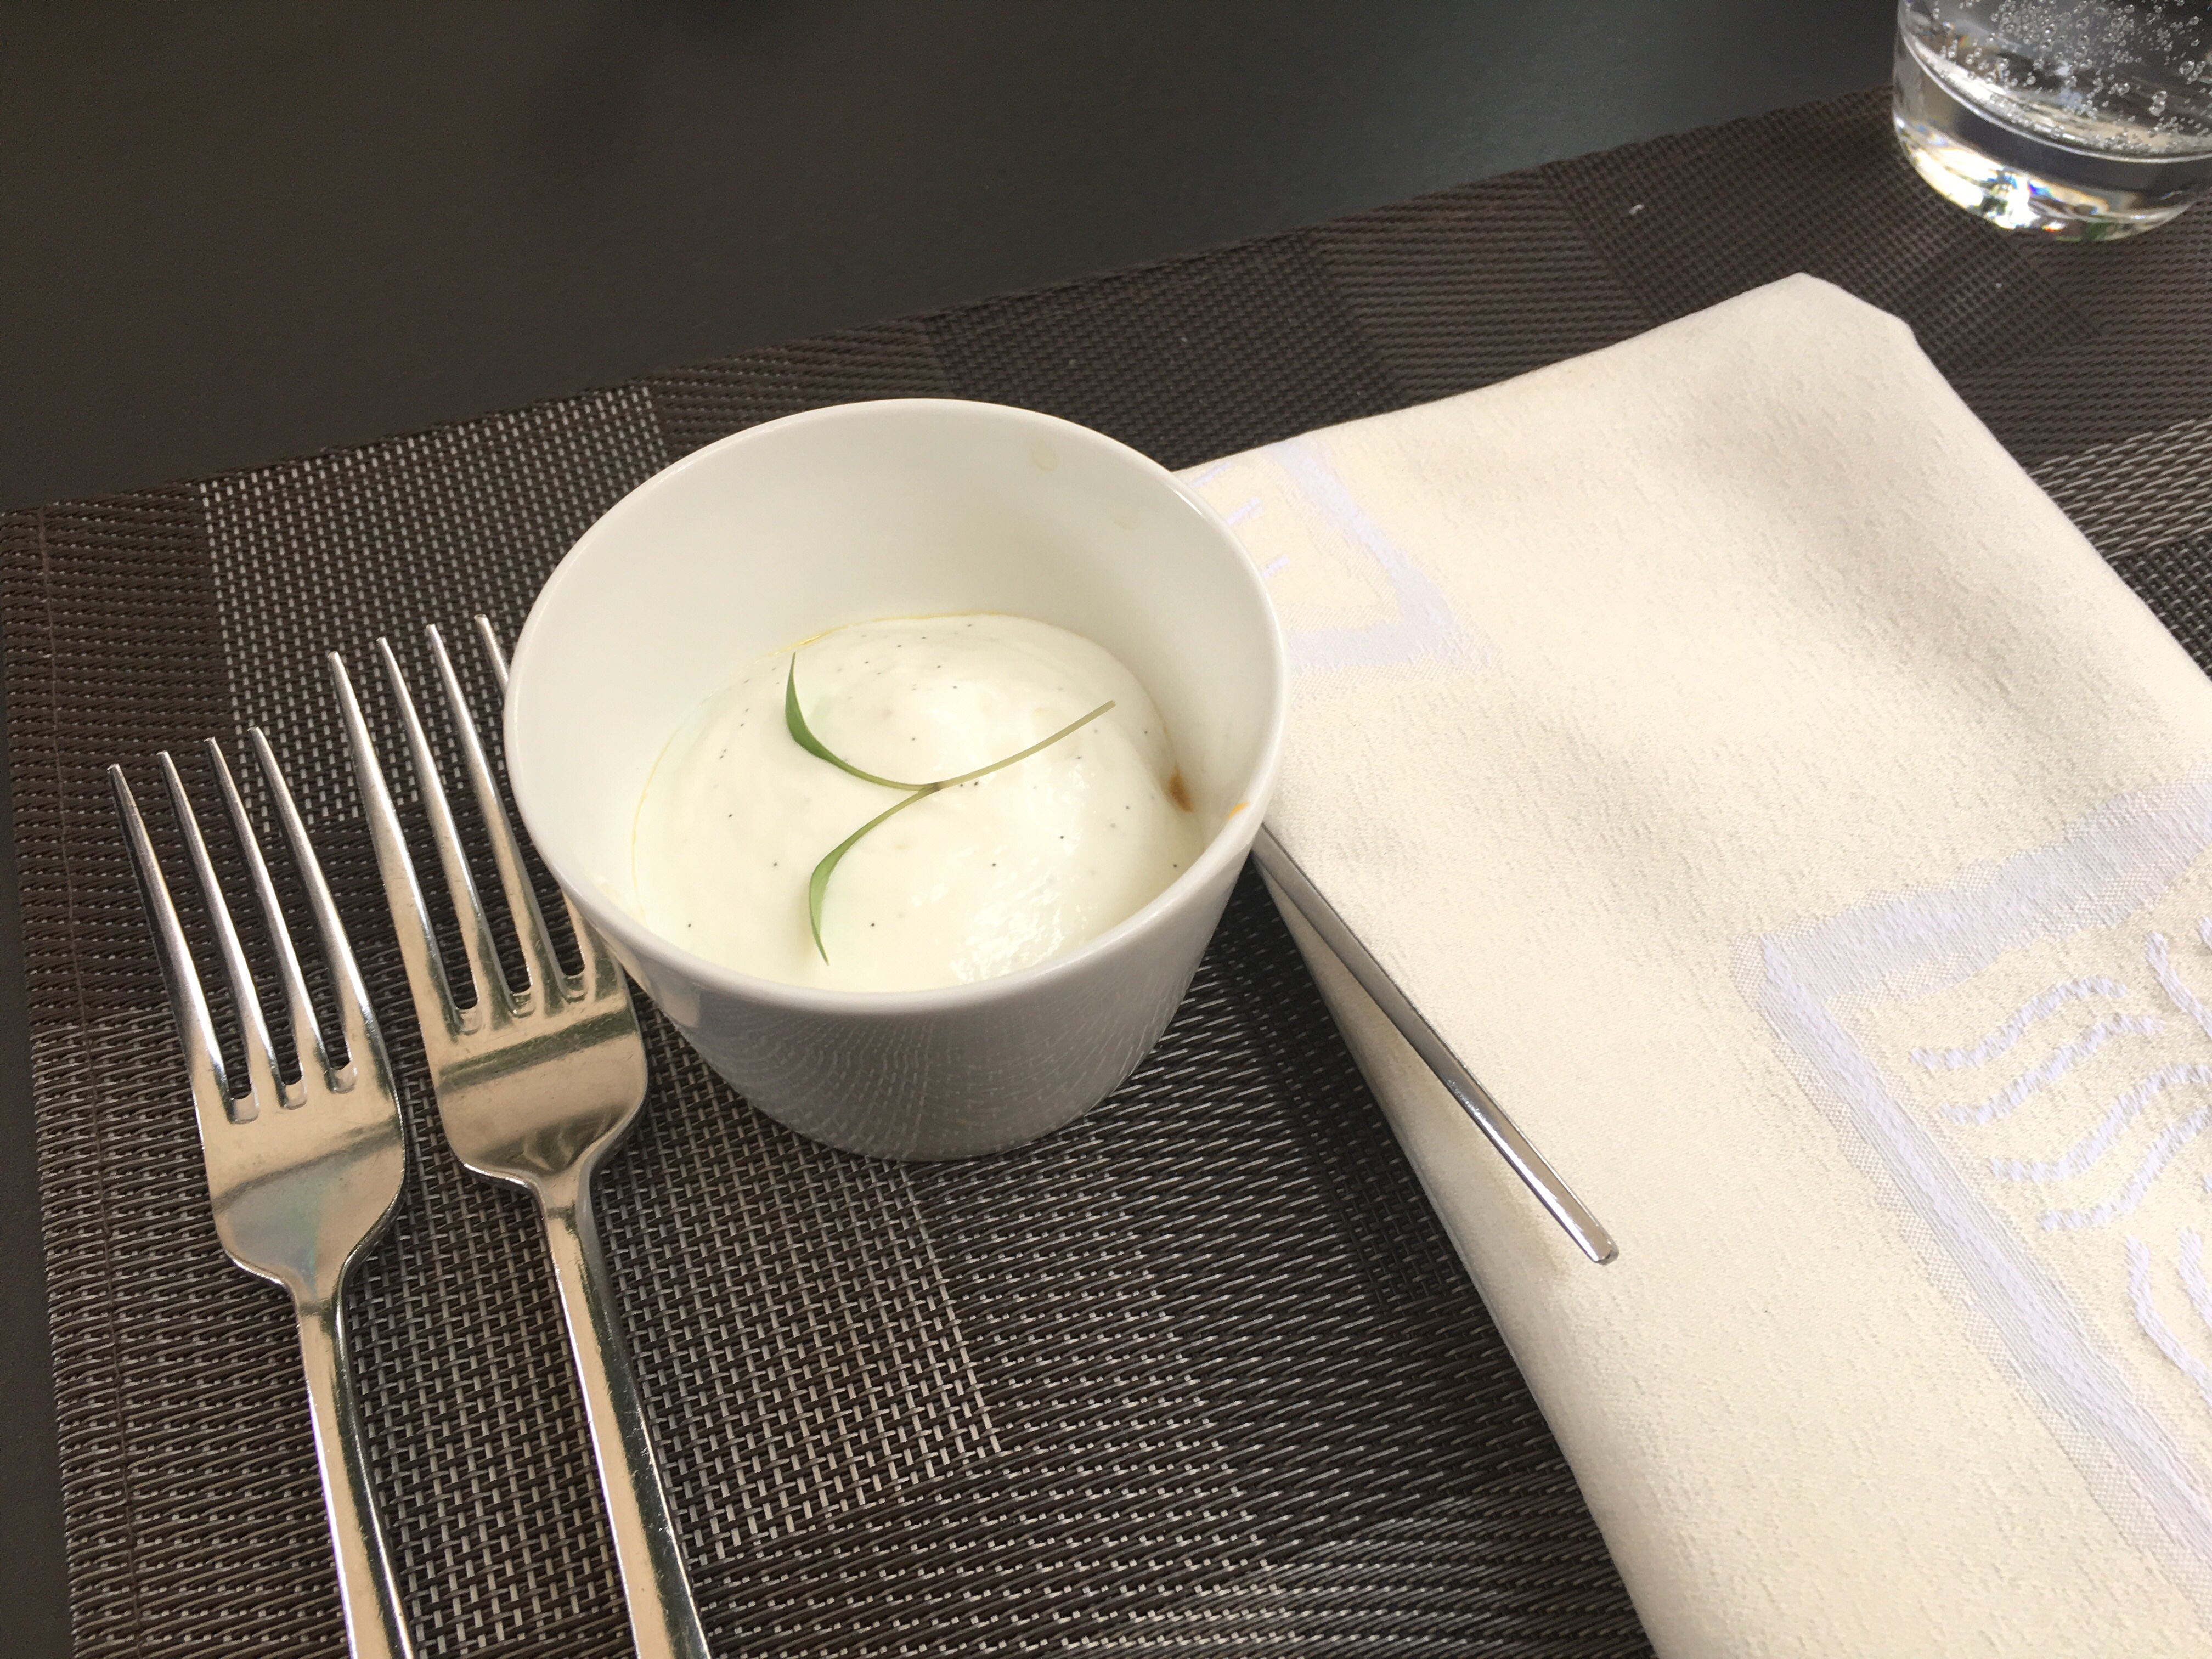 restaurant les plaisirs gourmands Schiltigheim